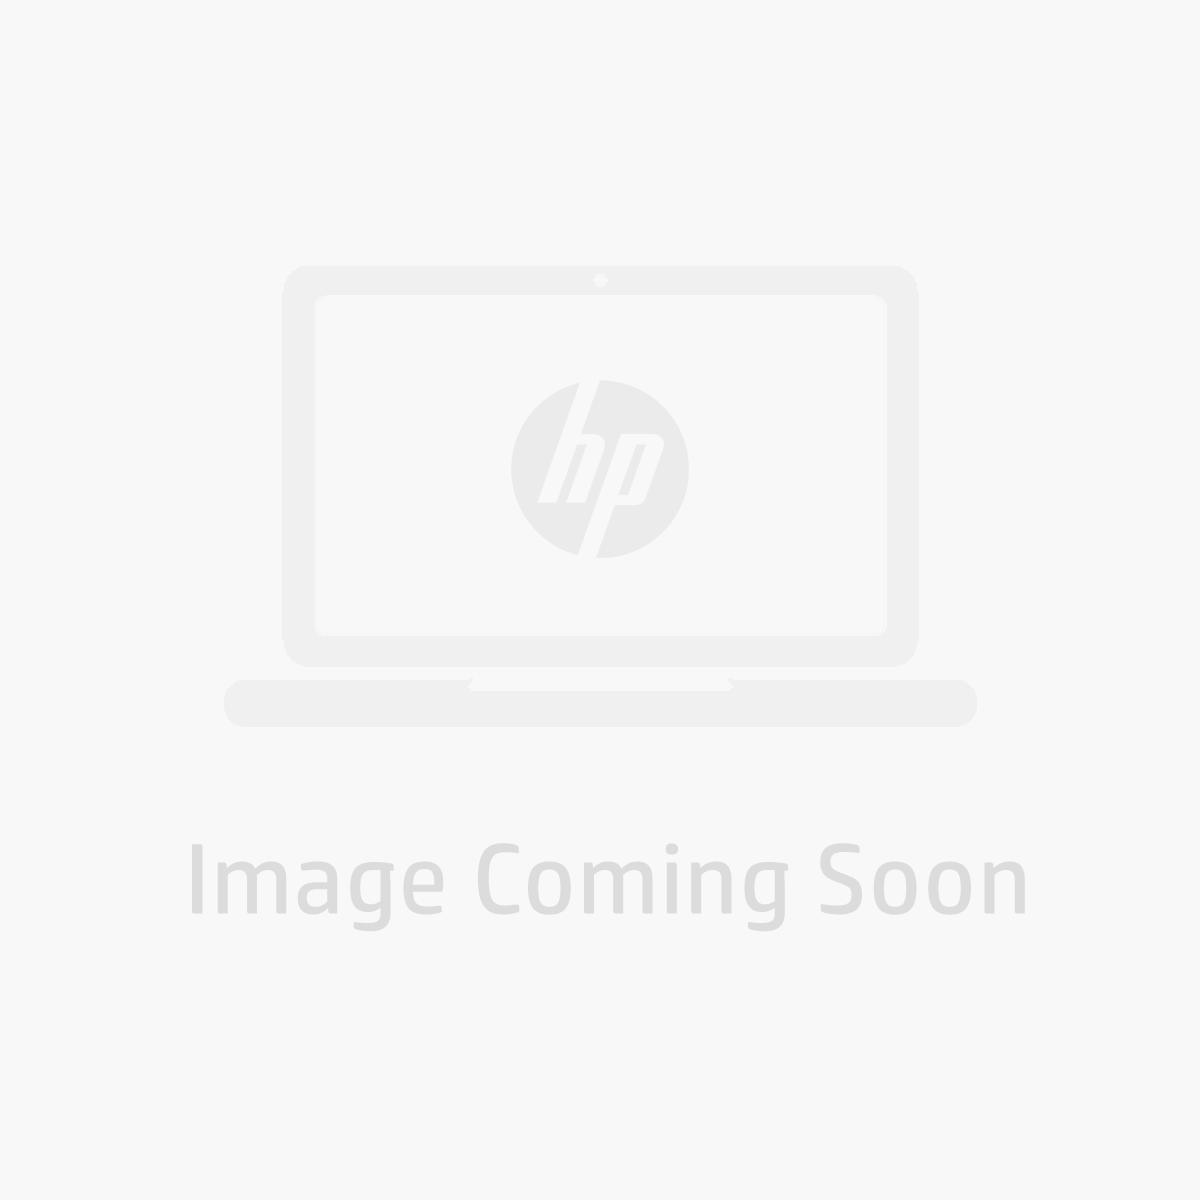 HP ProBook 450 G6 i7 laptop bundle - (Office 365 Personal)